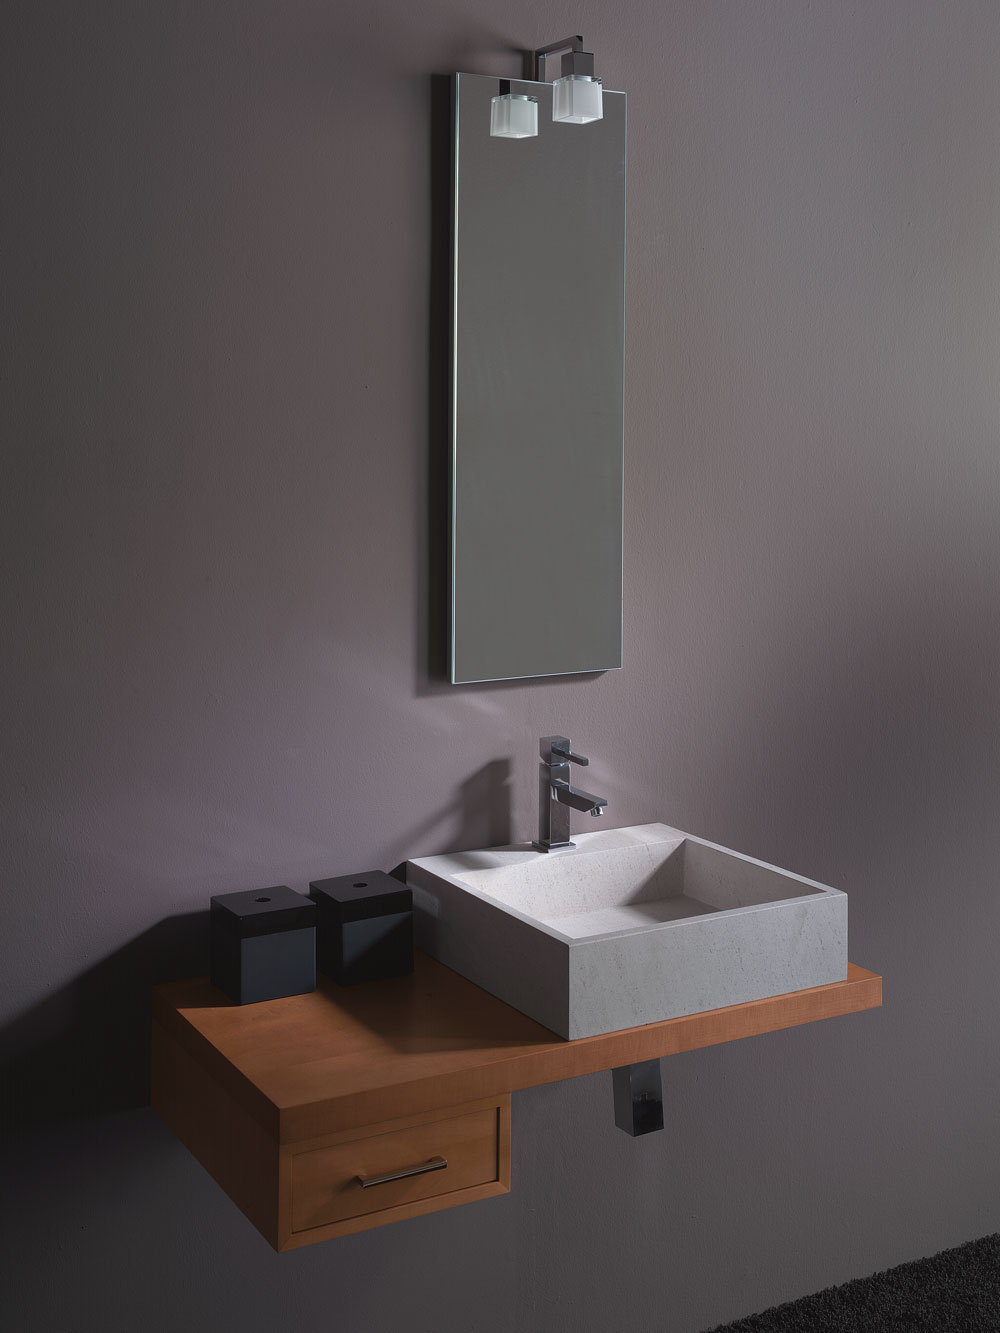 unibano-banos-pequenos-11